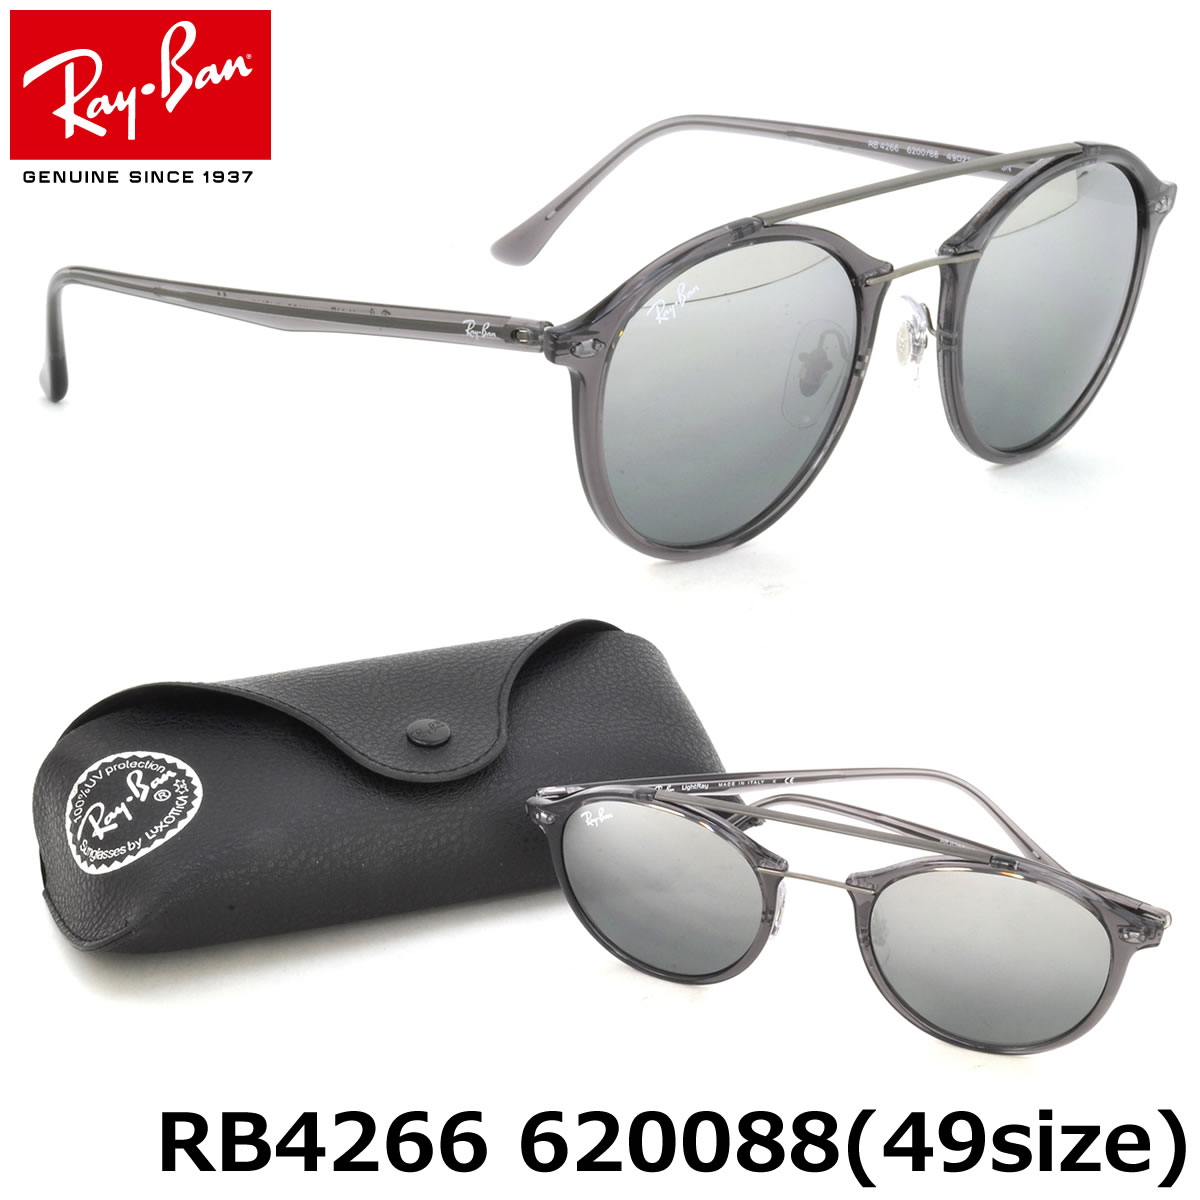 3da857cc6e แว่นกันแดด RayBan Tech RB4266 620088 size 49mm กรอบพลาสติคสีเทา  เลนส์ปรอทเทาไล่เฉด